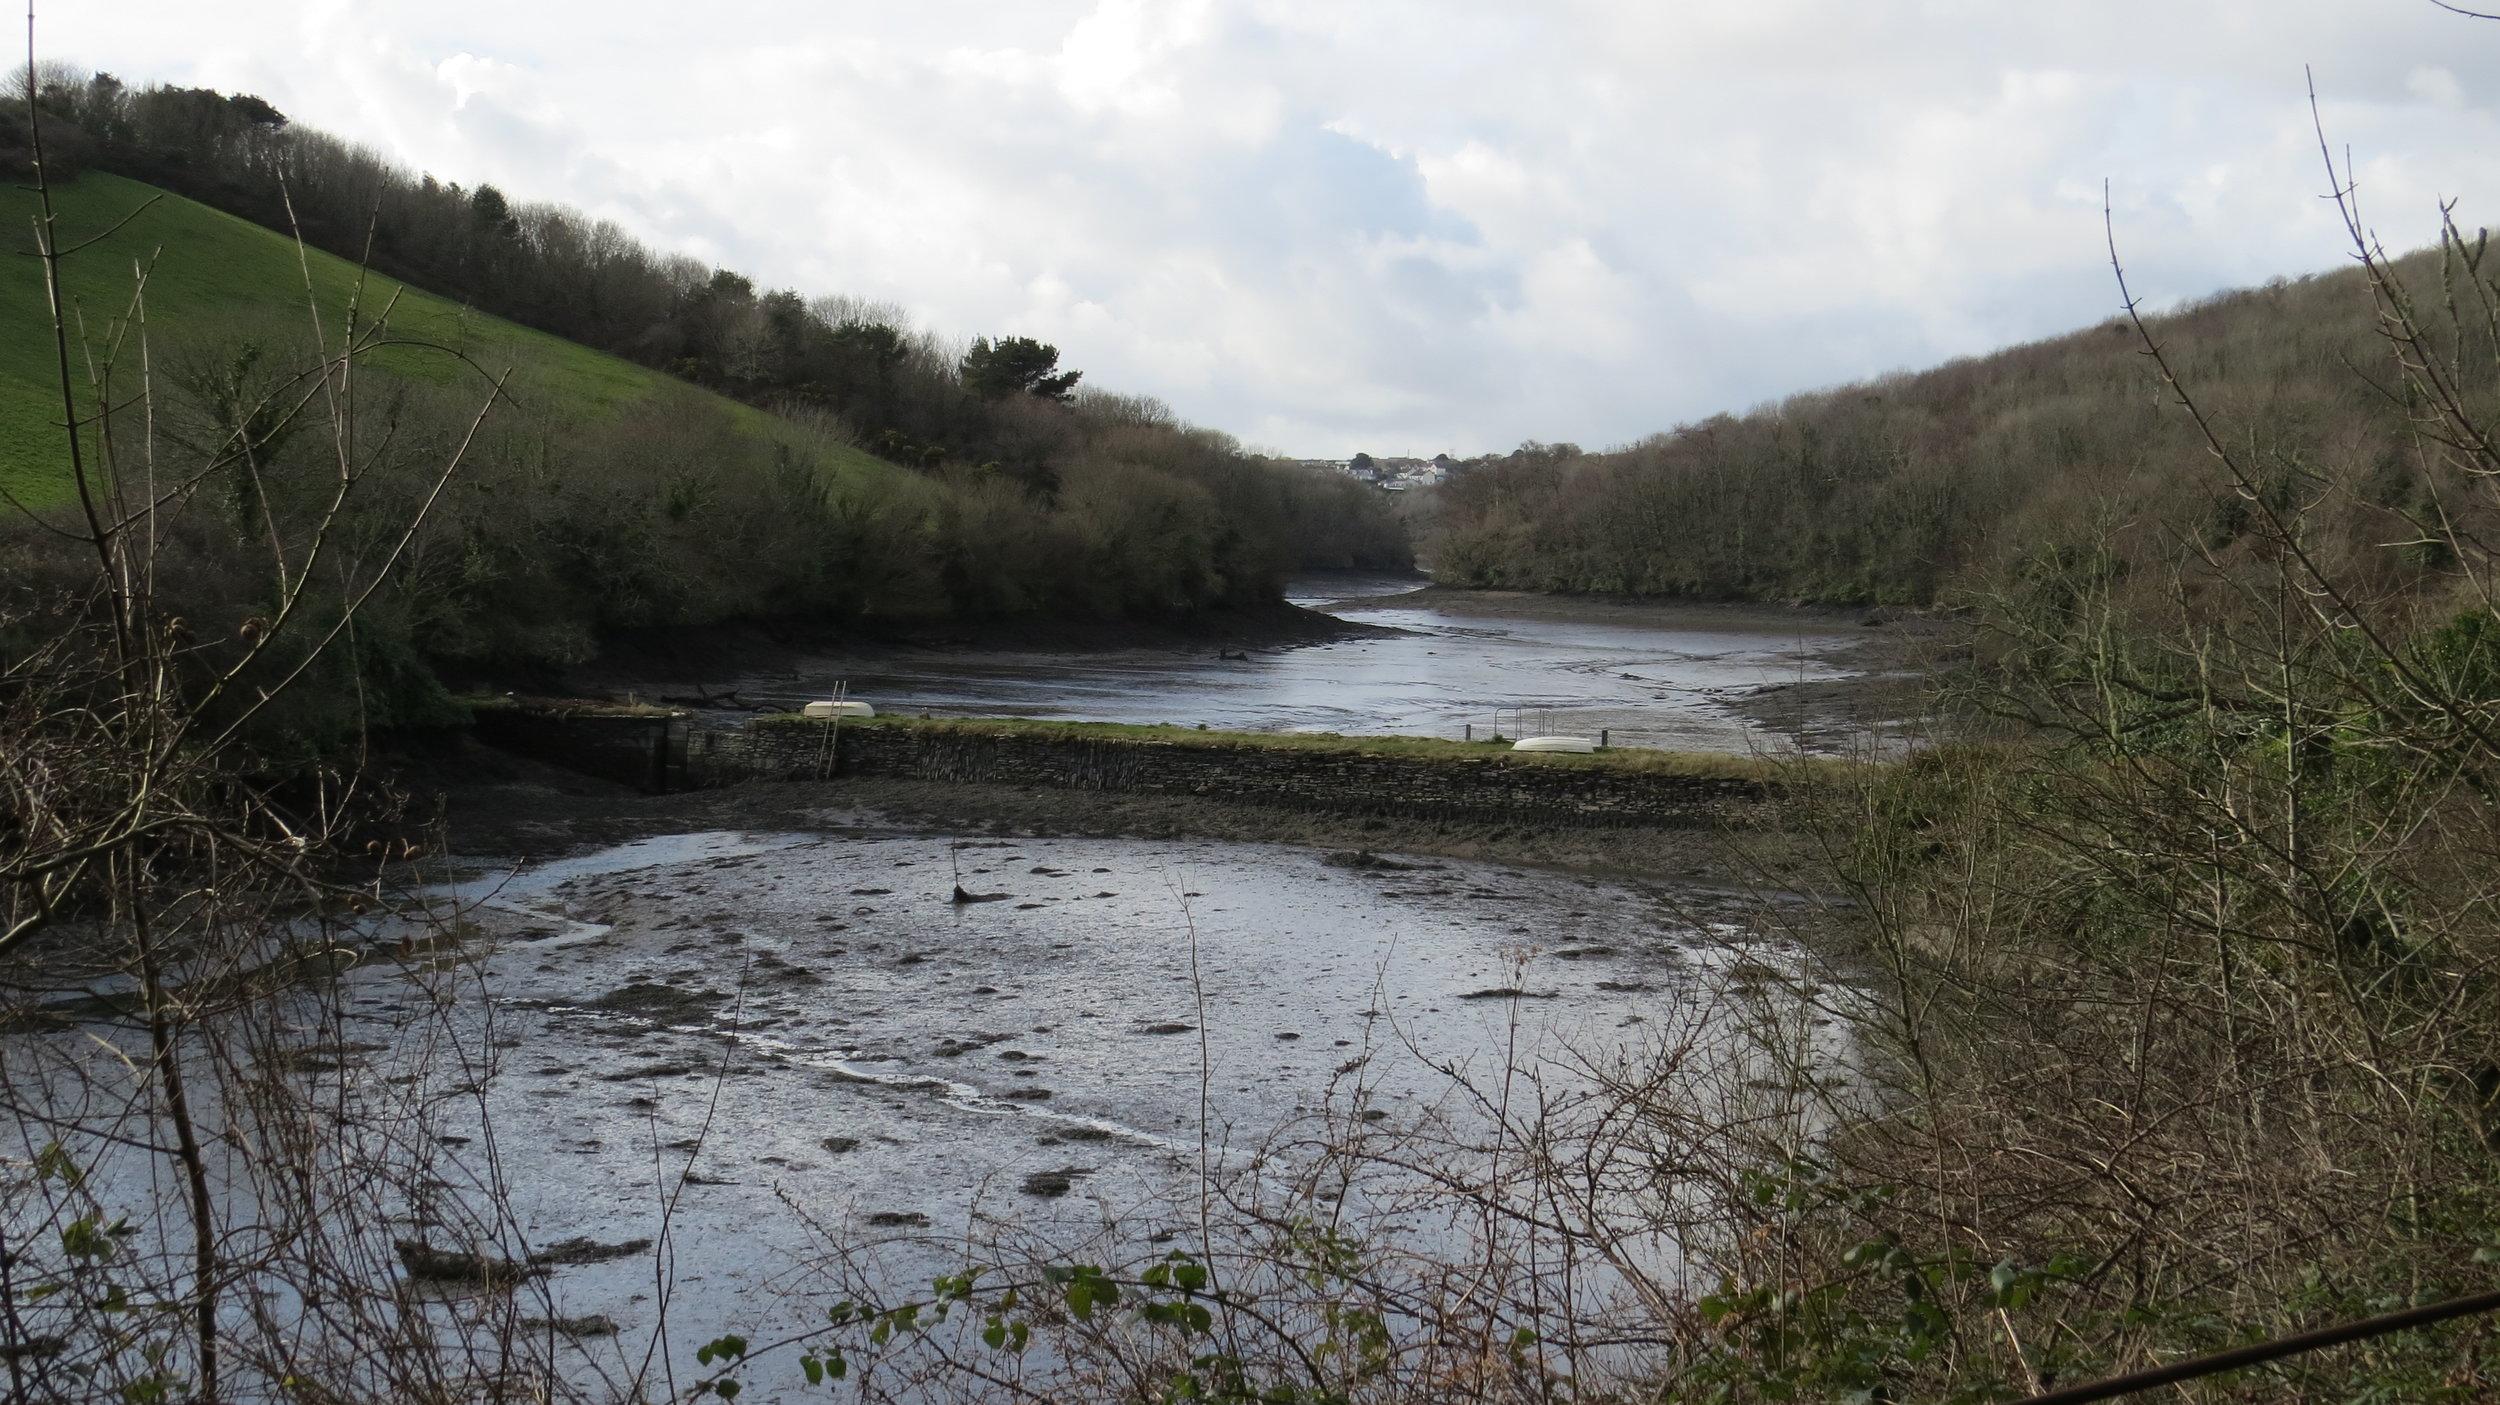 Porth Creek